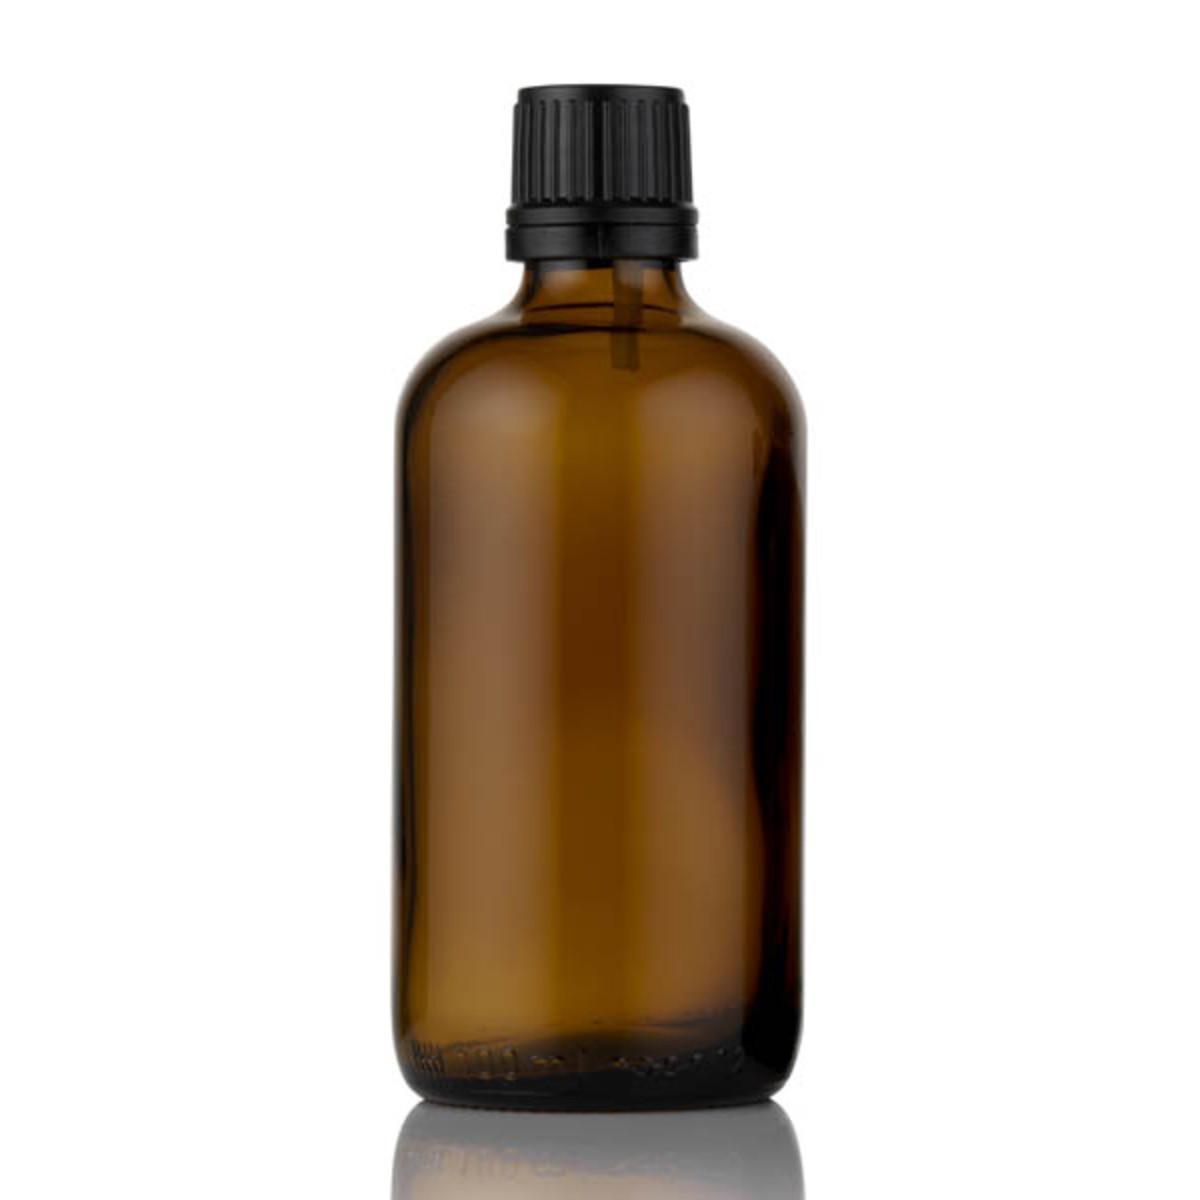 Amber Bottle for storing Essential Oils